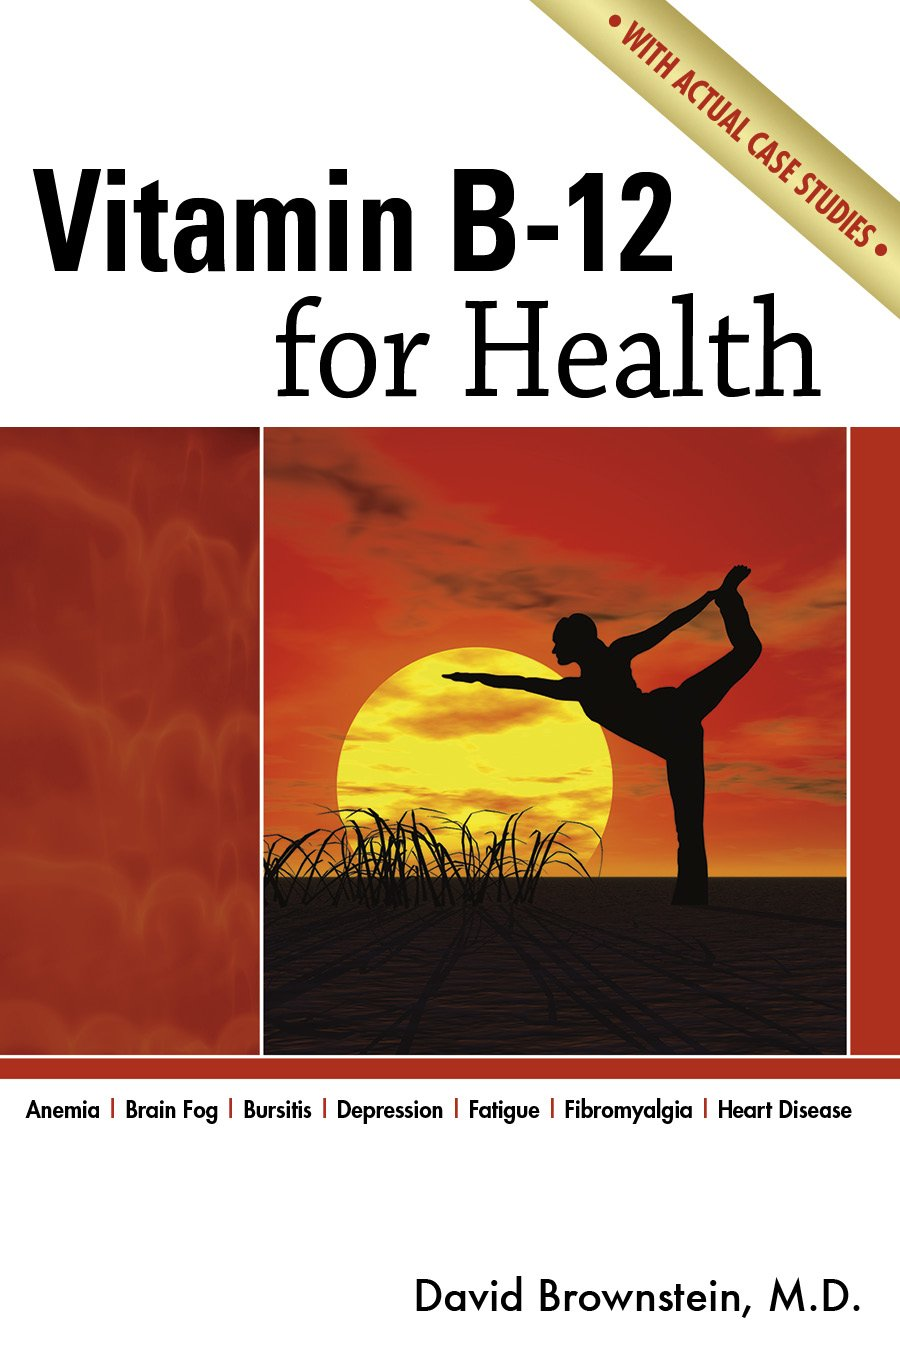 Vitamin B-12 for Health ebook